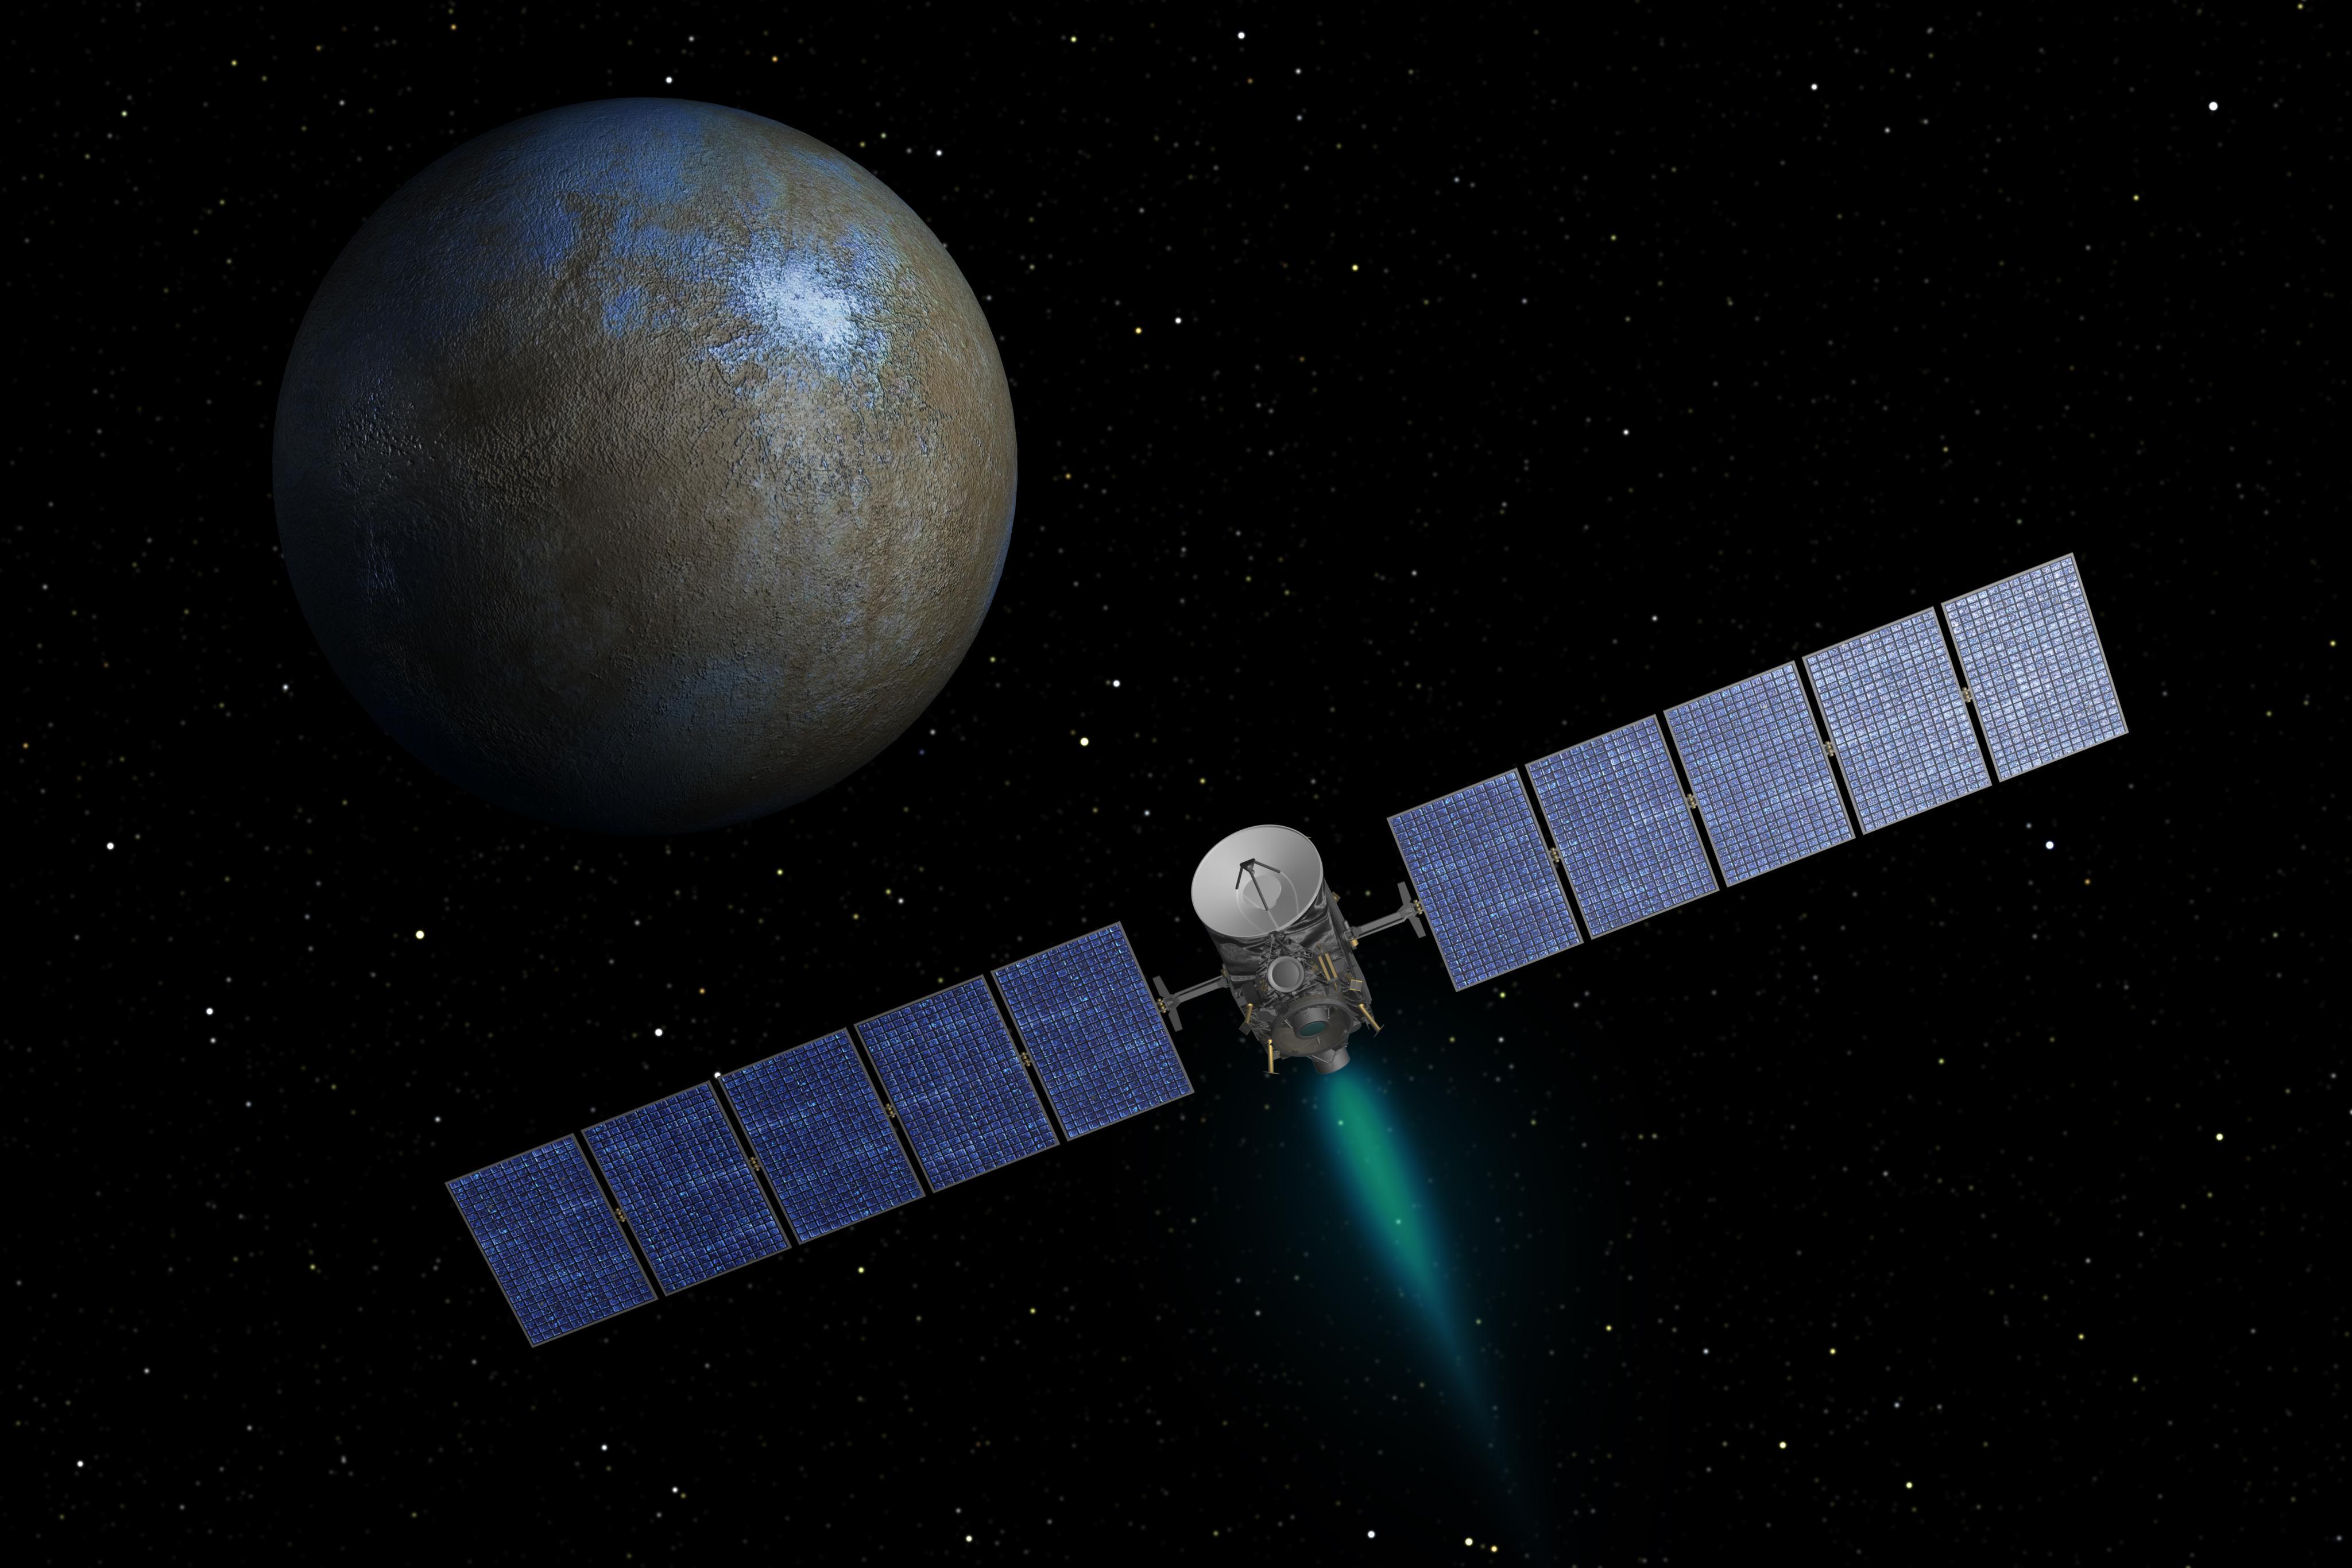 NASA Spacecraft Approaching Dwarf Planet Ceres